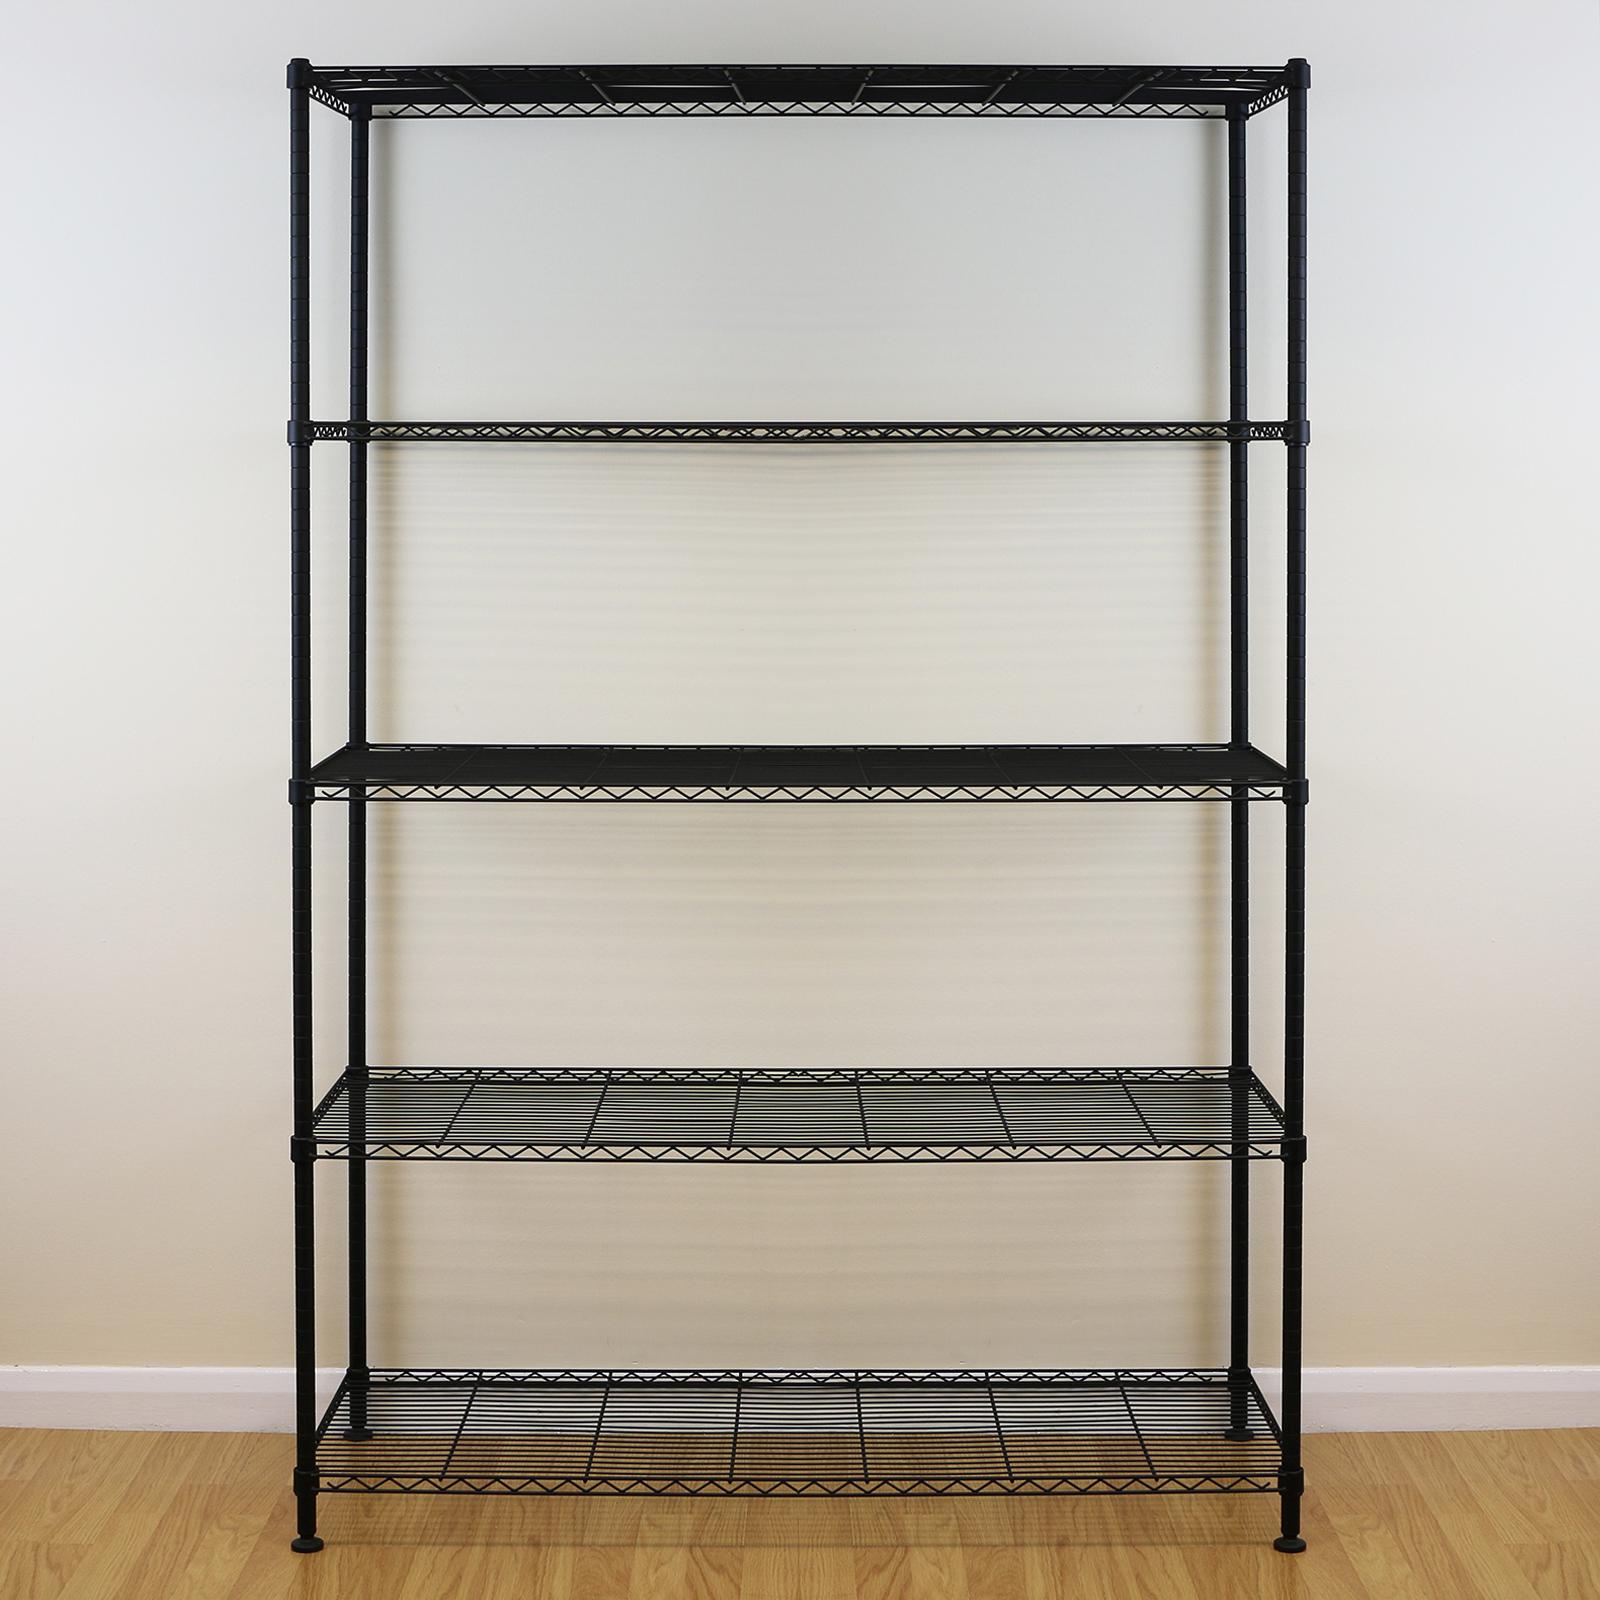 5 stufen schwarz metal lagerregal regal draht regal k che b roeinheit 180cm ebay. Black Bedroom Furniture Sets. Home Design Ideas